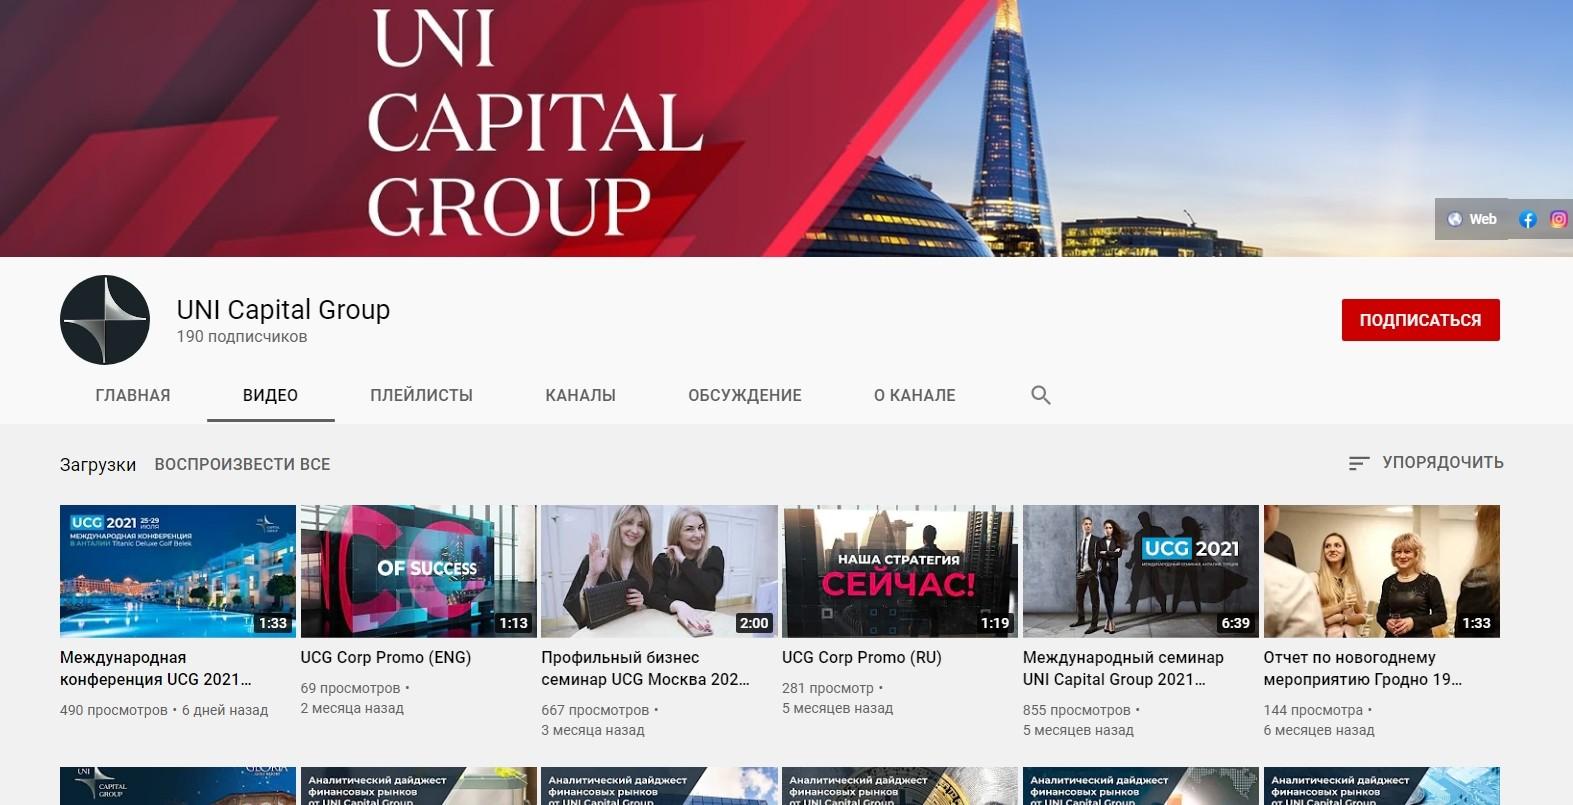 Ютуб канал UNI CAPITAL GROUP